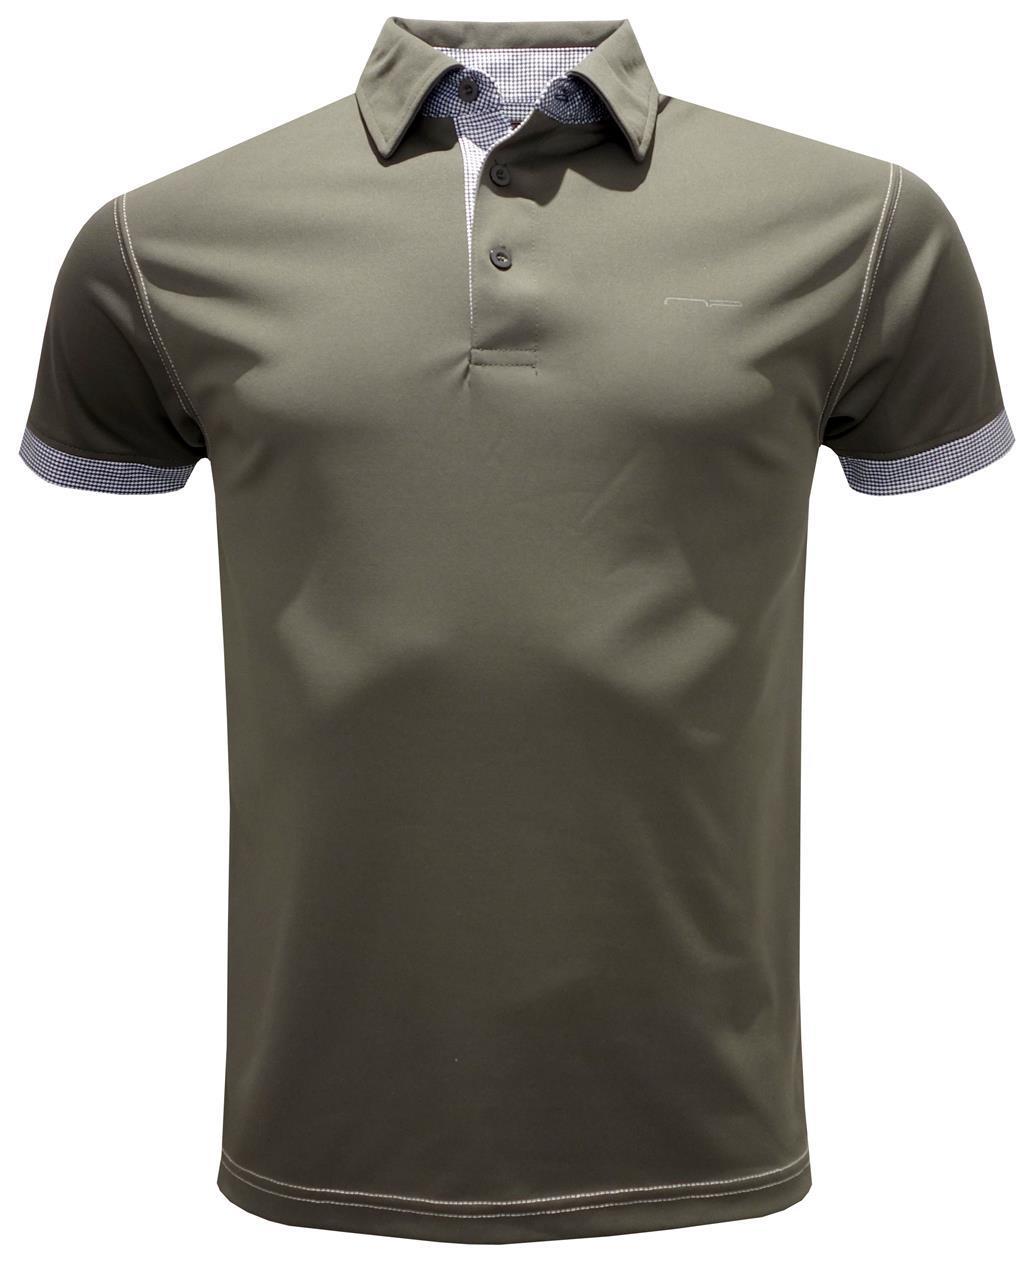 Shirt 1806 Olive M